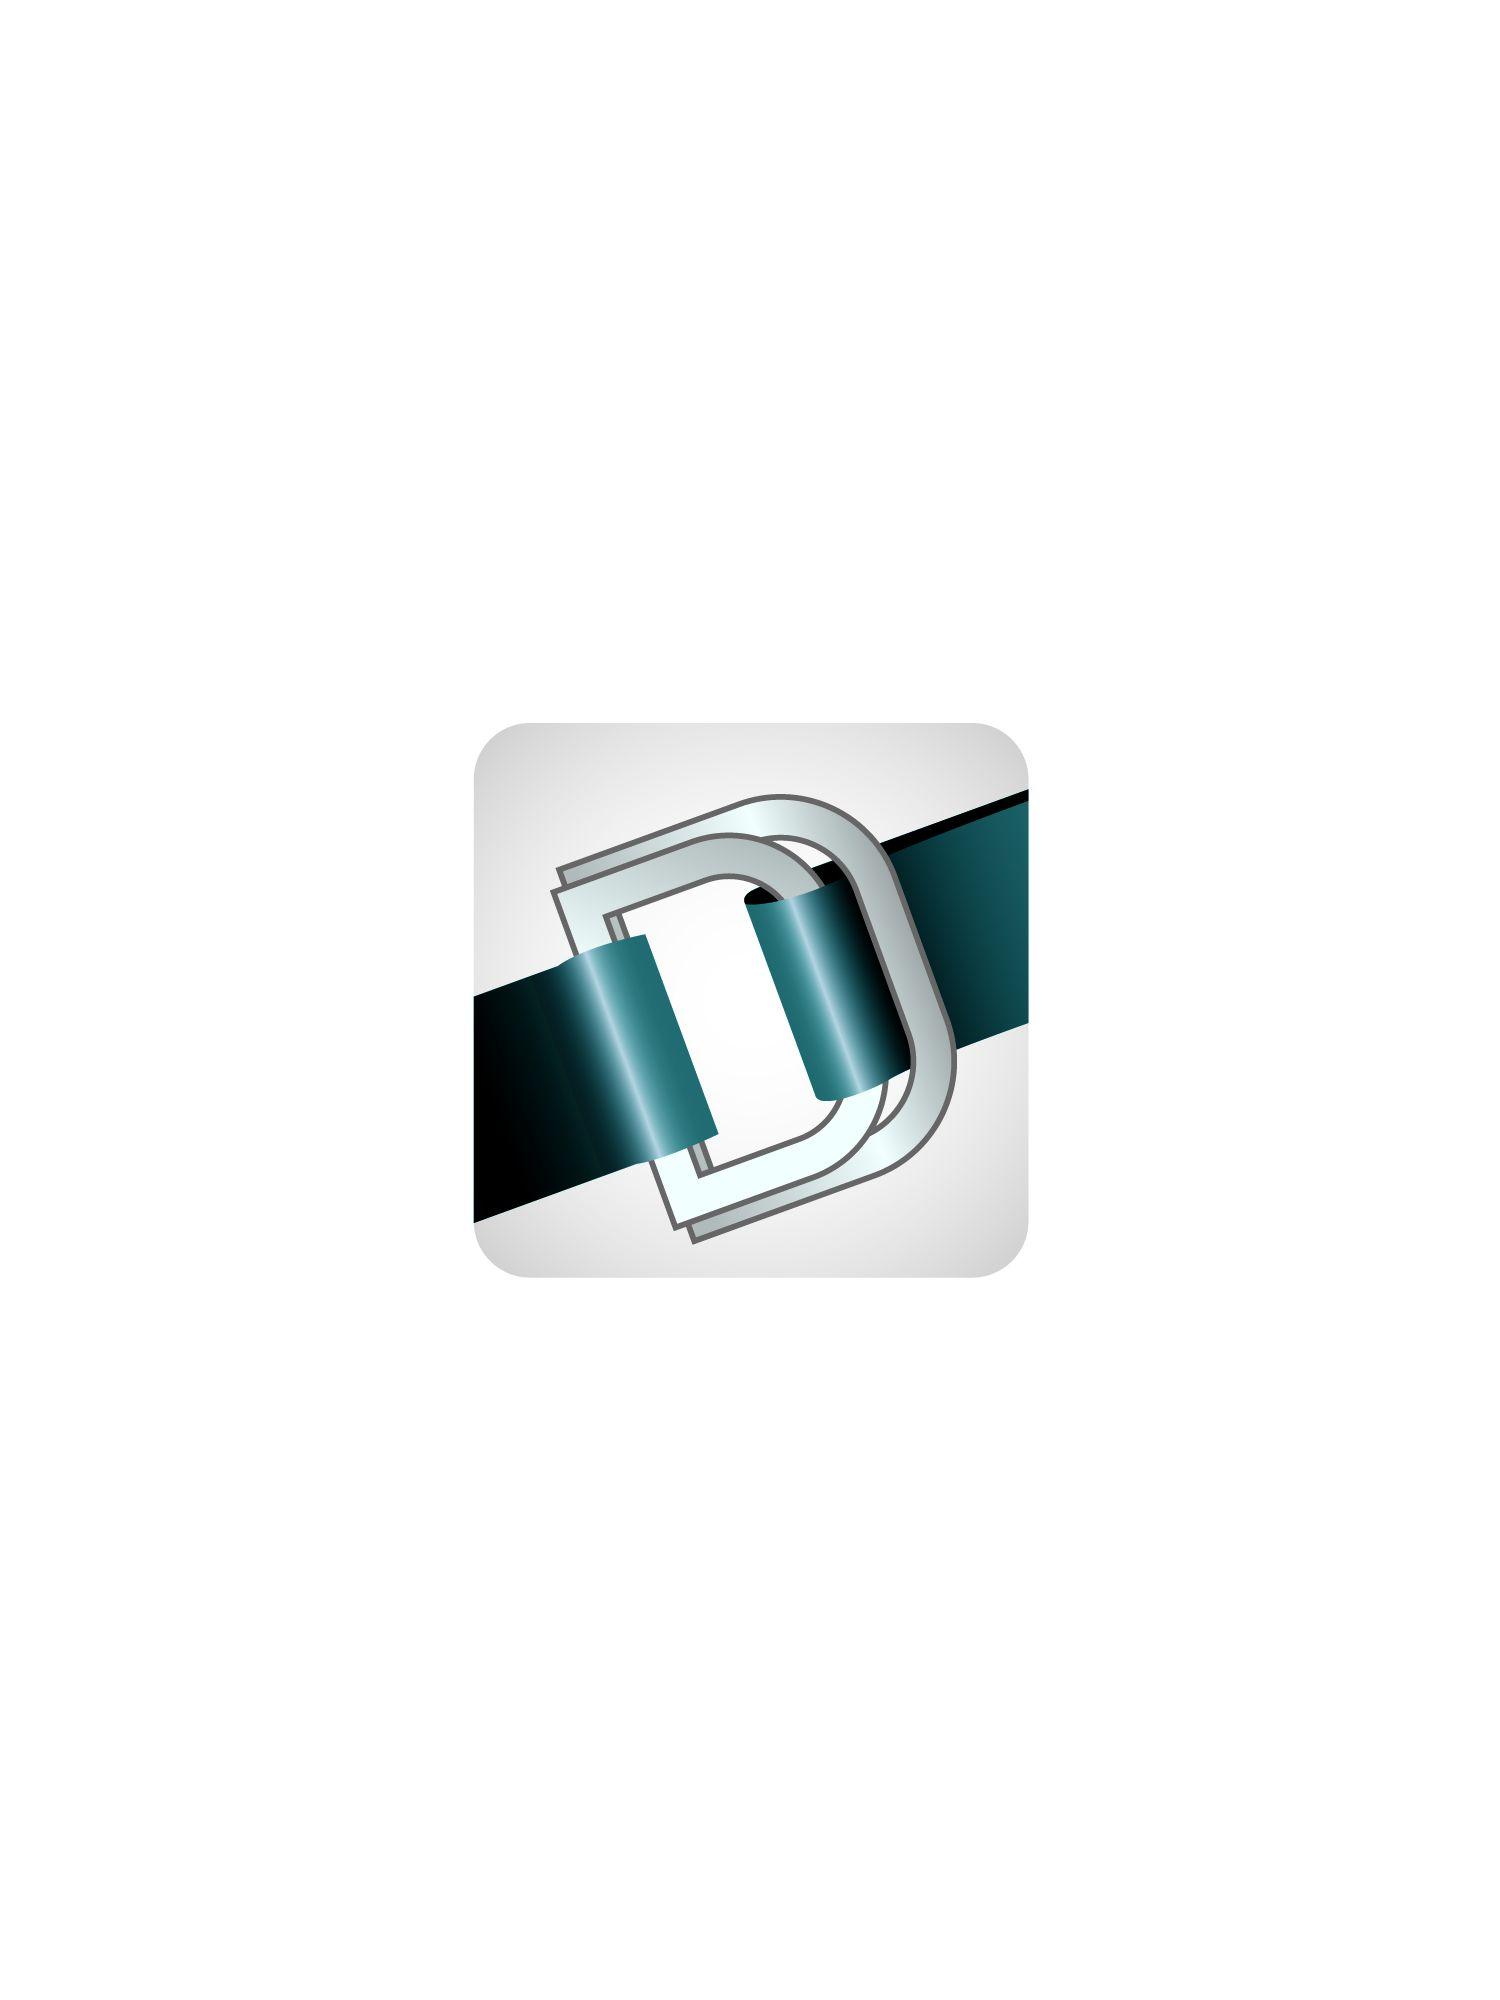 HJH147 | RPHA 11 IANNONE 29 REPLICA[1color]